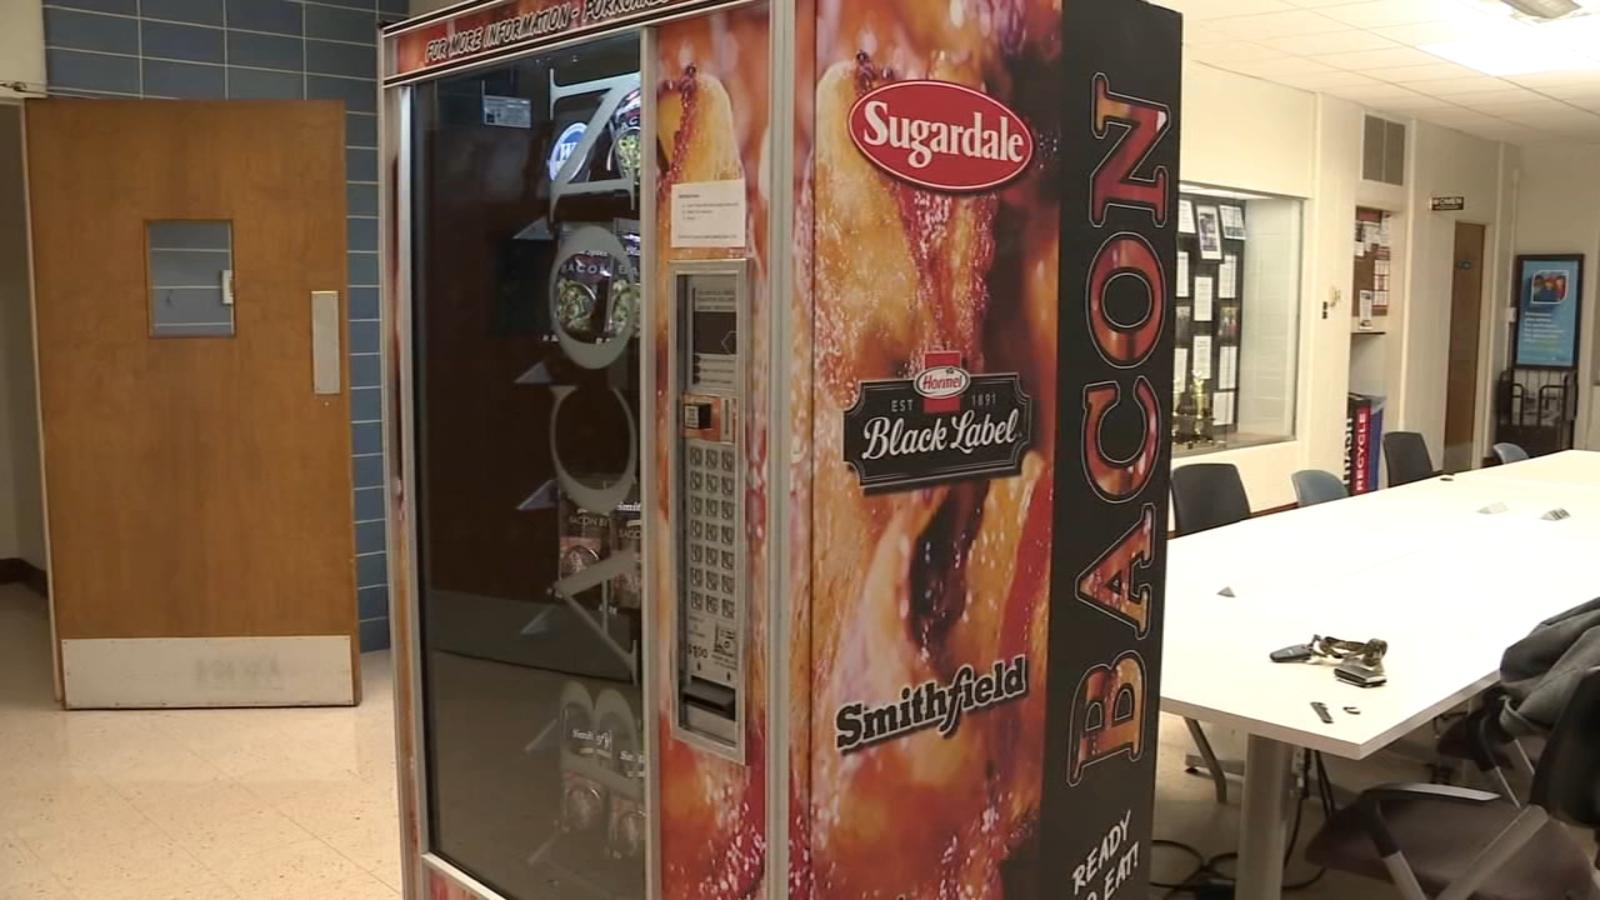 Comfort food? Ohio State University installs bacon vending machine